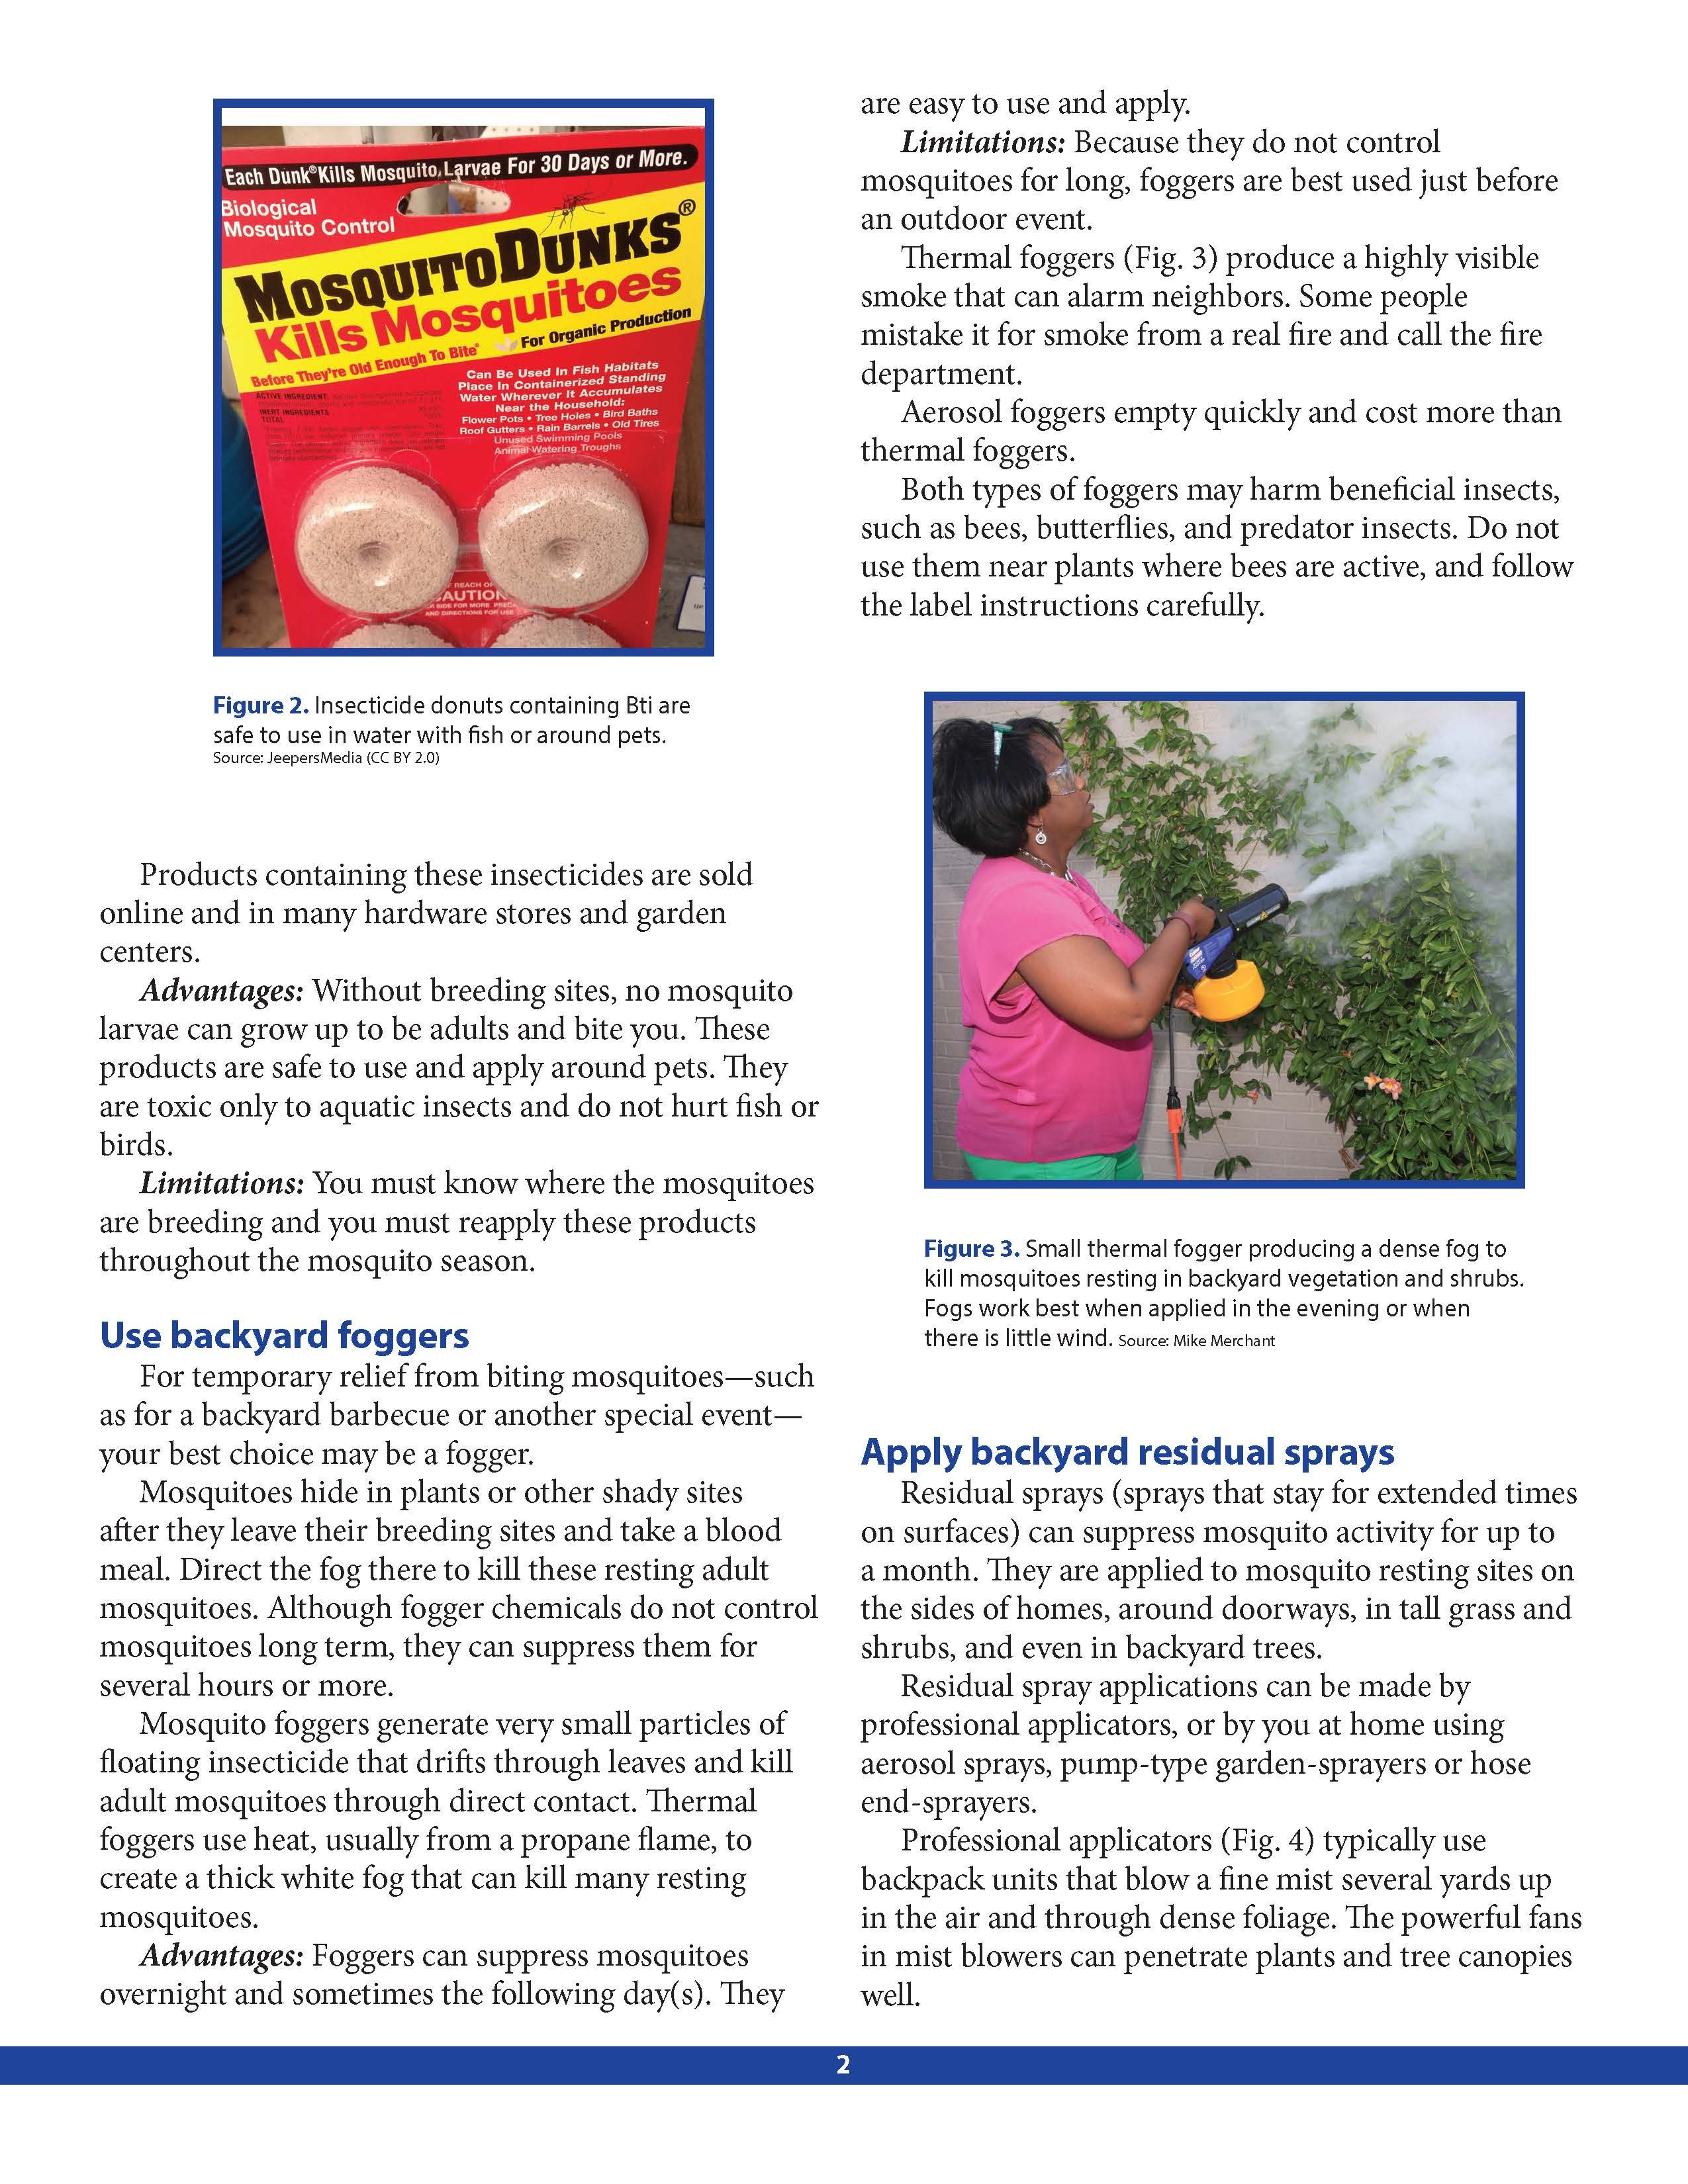 diy backyard mosquito control page 2 by texas a u0026m agrilife